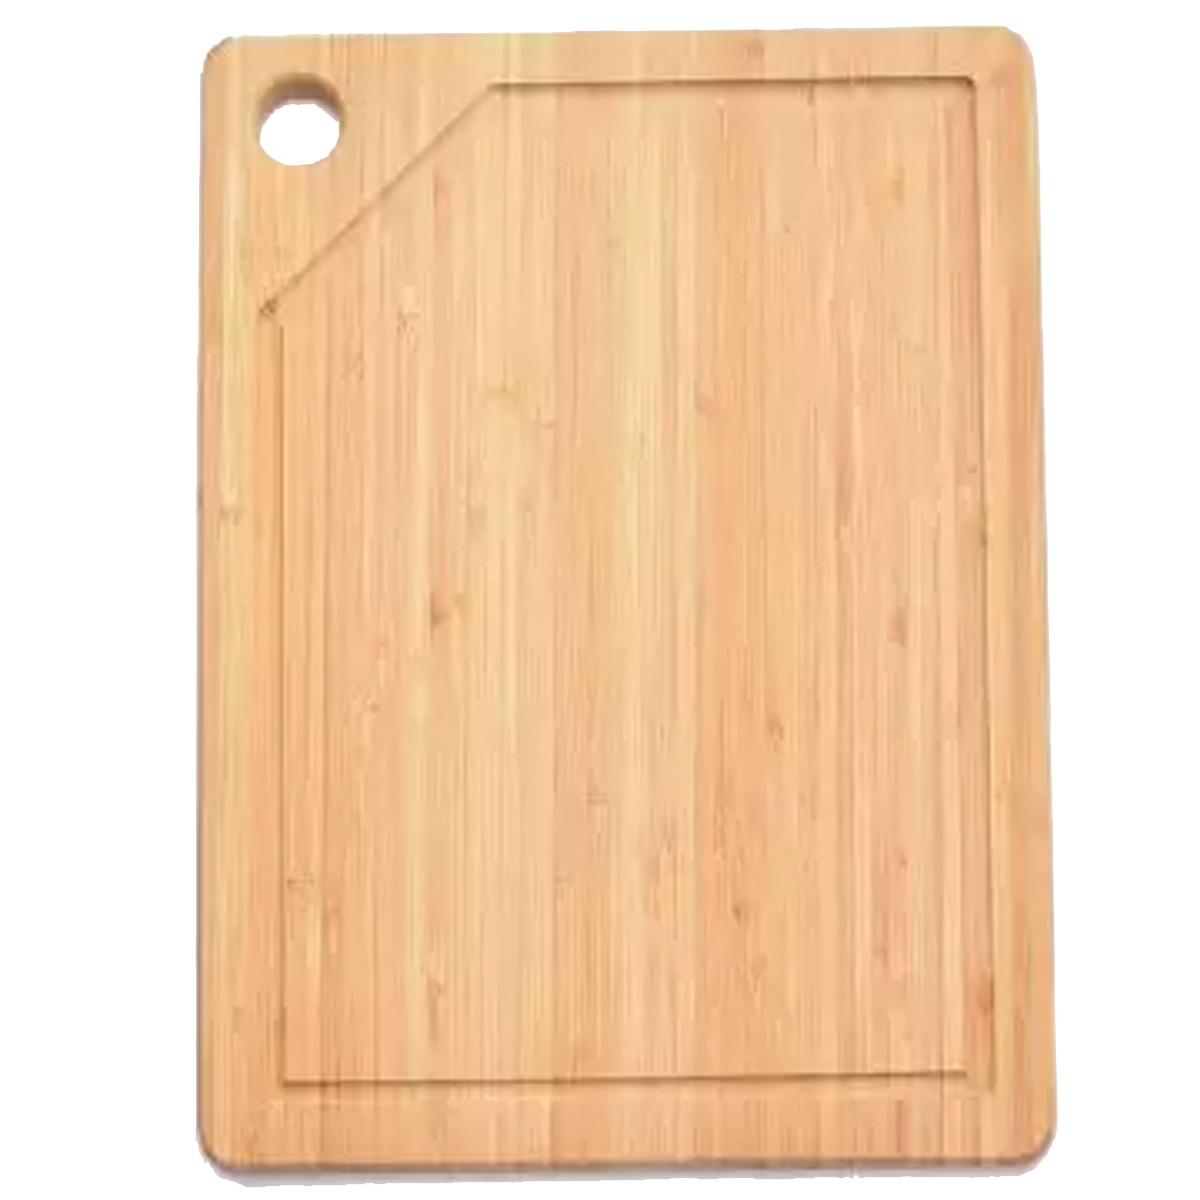 Tábua de corte retangular 33,5x21,5cm de Bambu ecológico